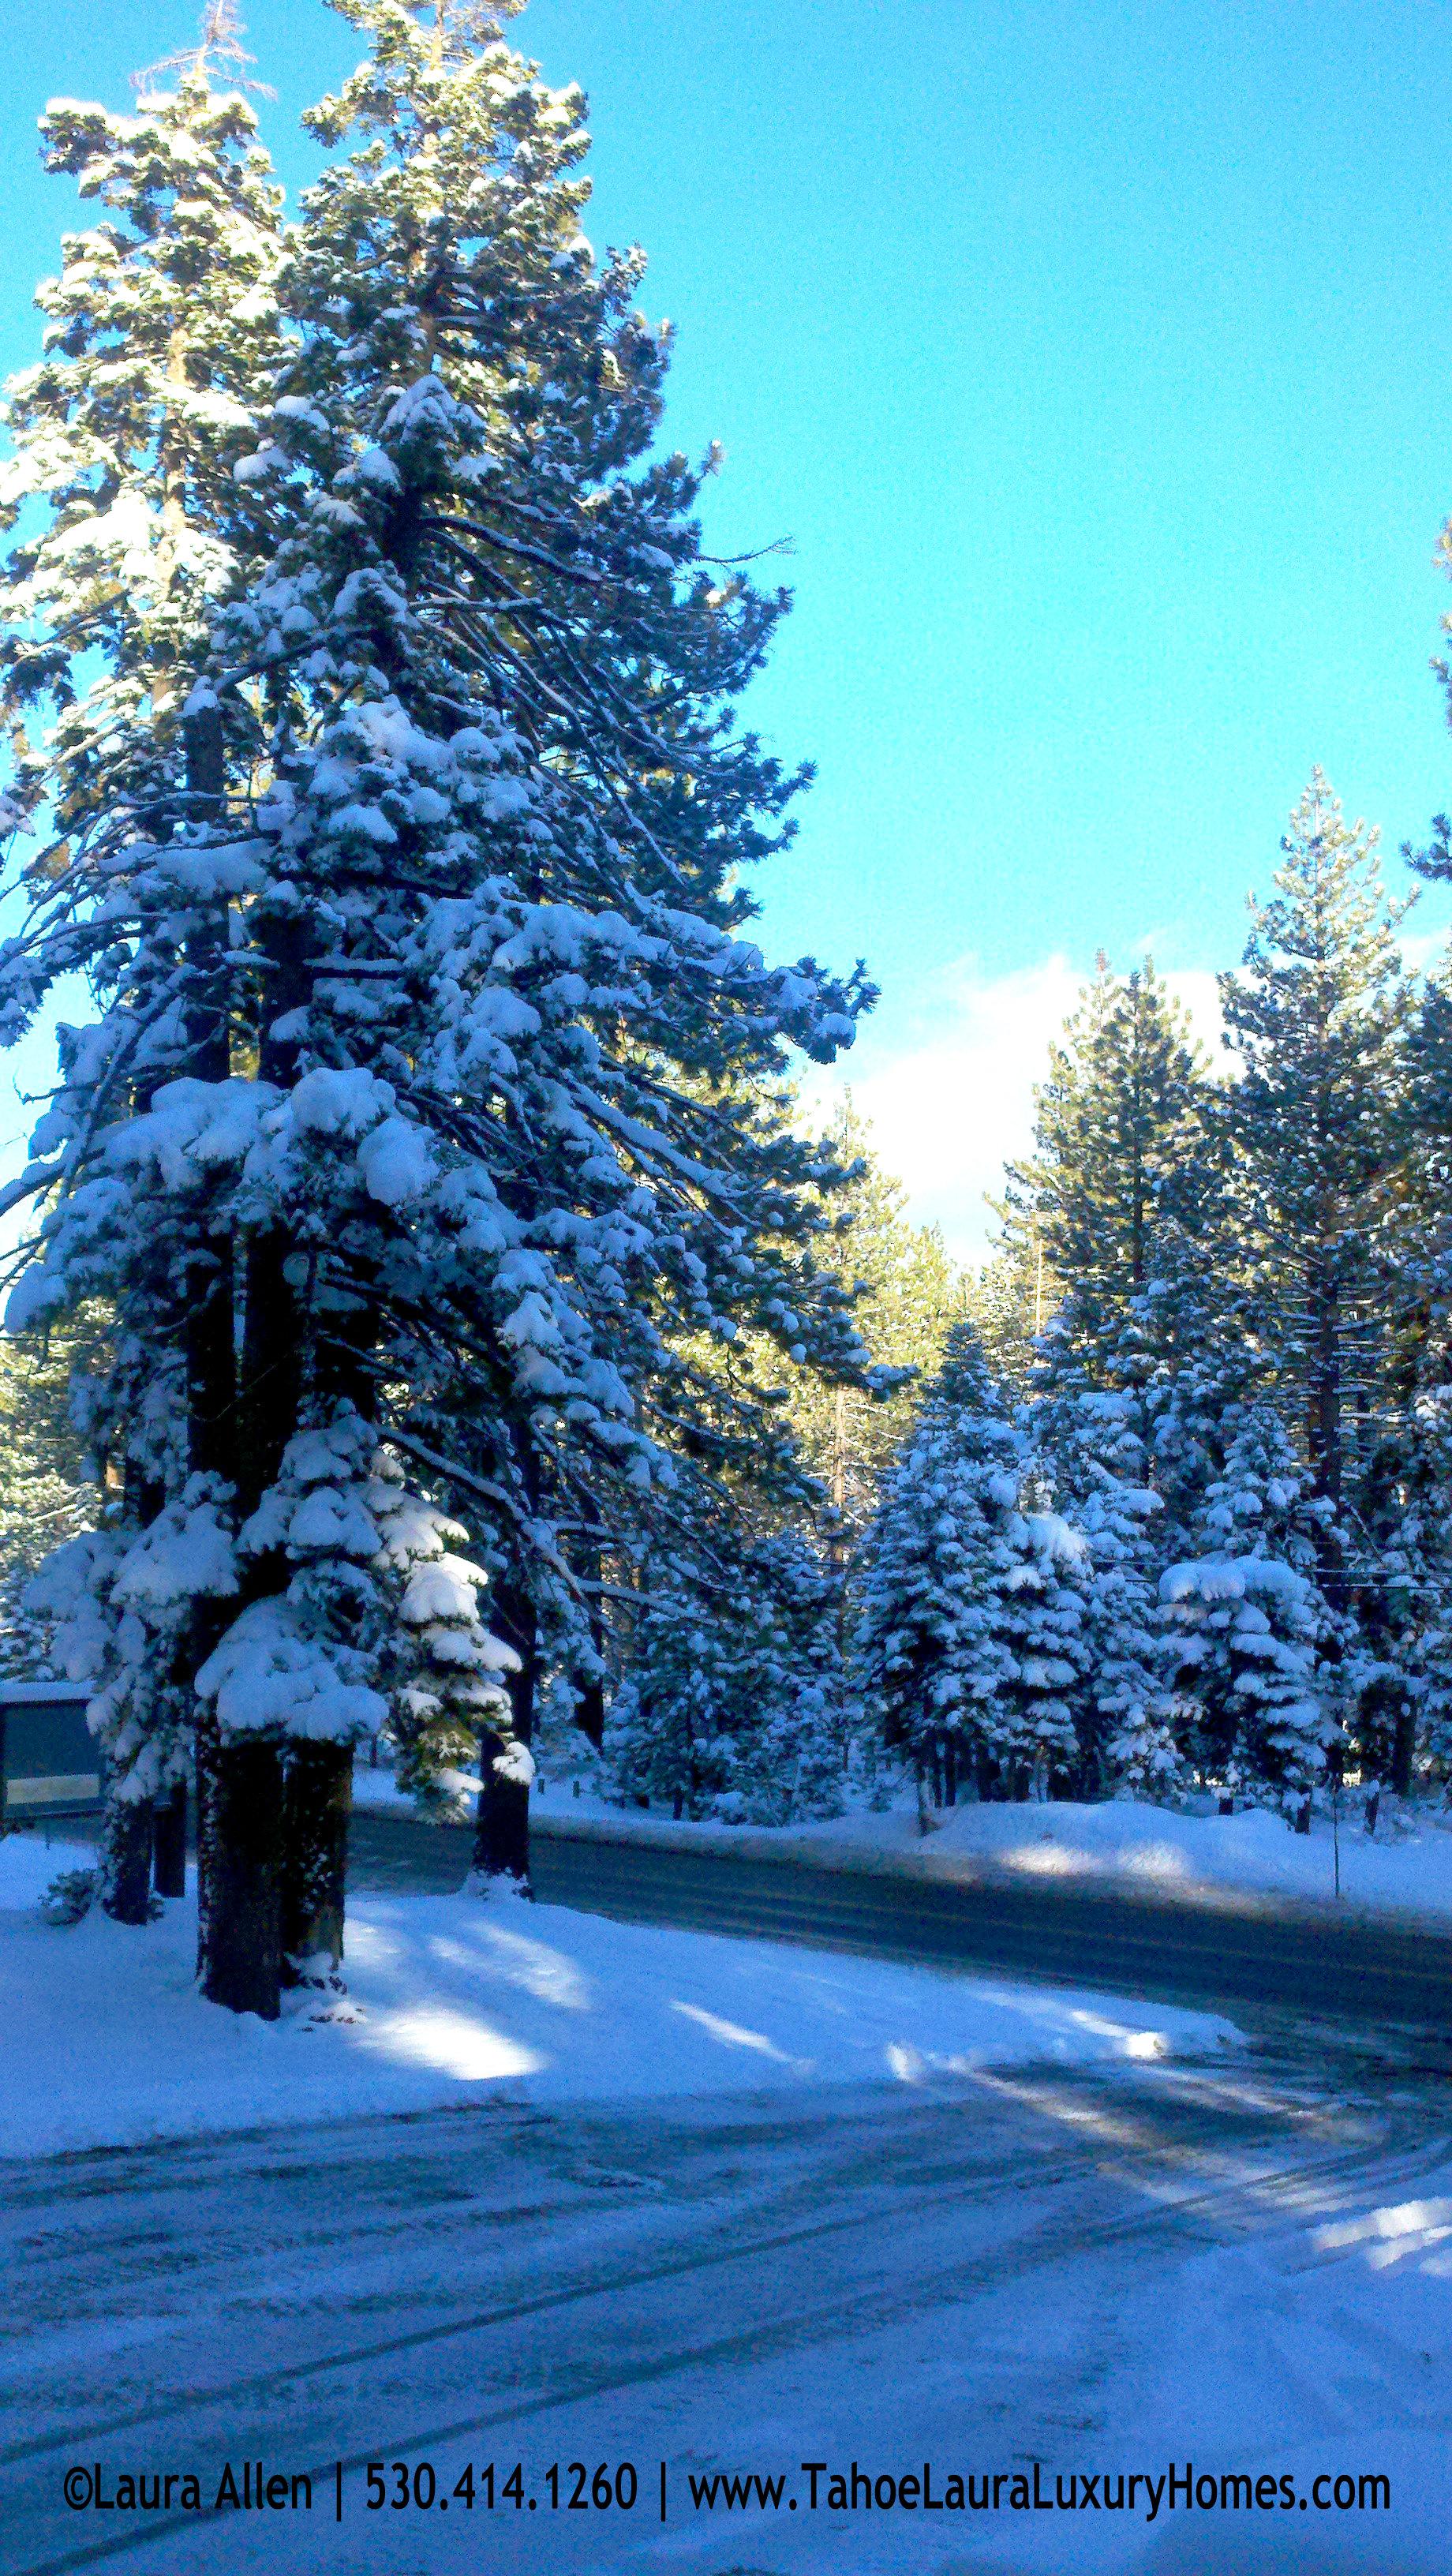 Lake Tahoe Winter Wallpaper Desktop Background: Winter Travel Tips For Tahoe City